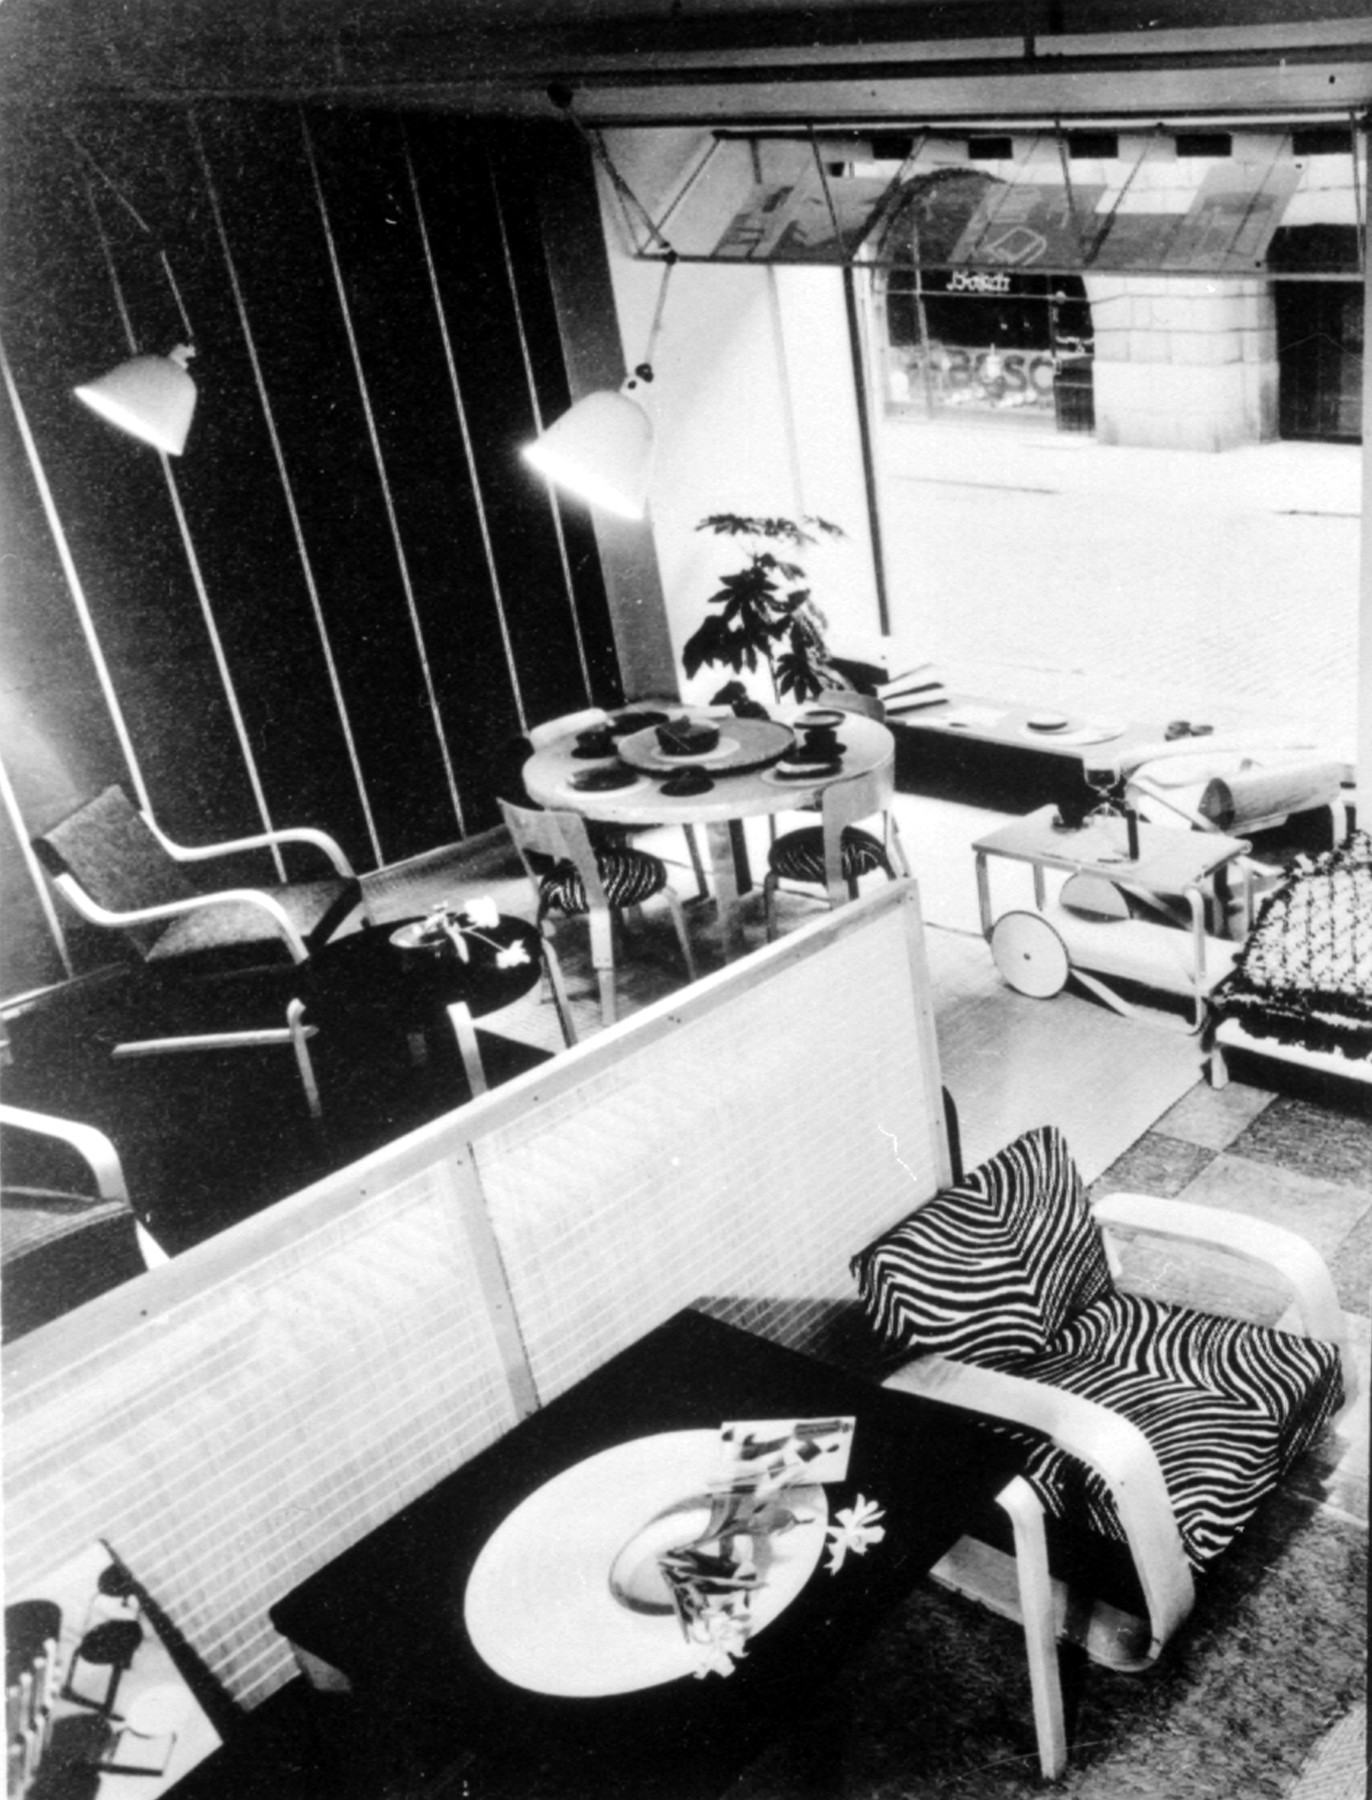 1840351 Fabianinkatu first Artek store in Helsinki 1936 master